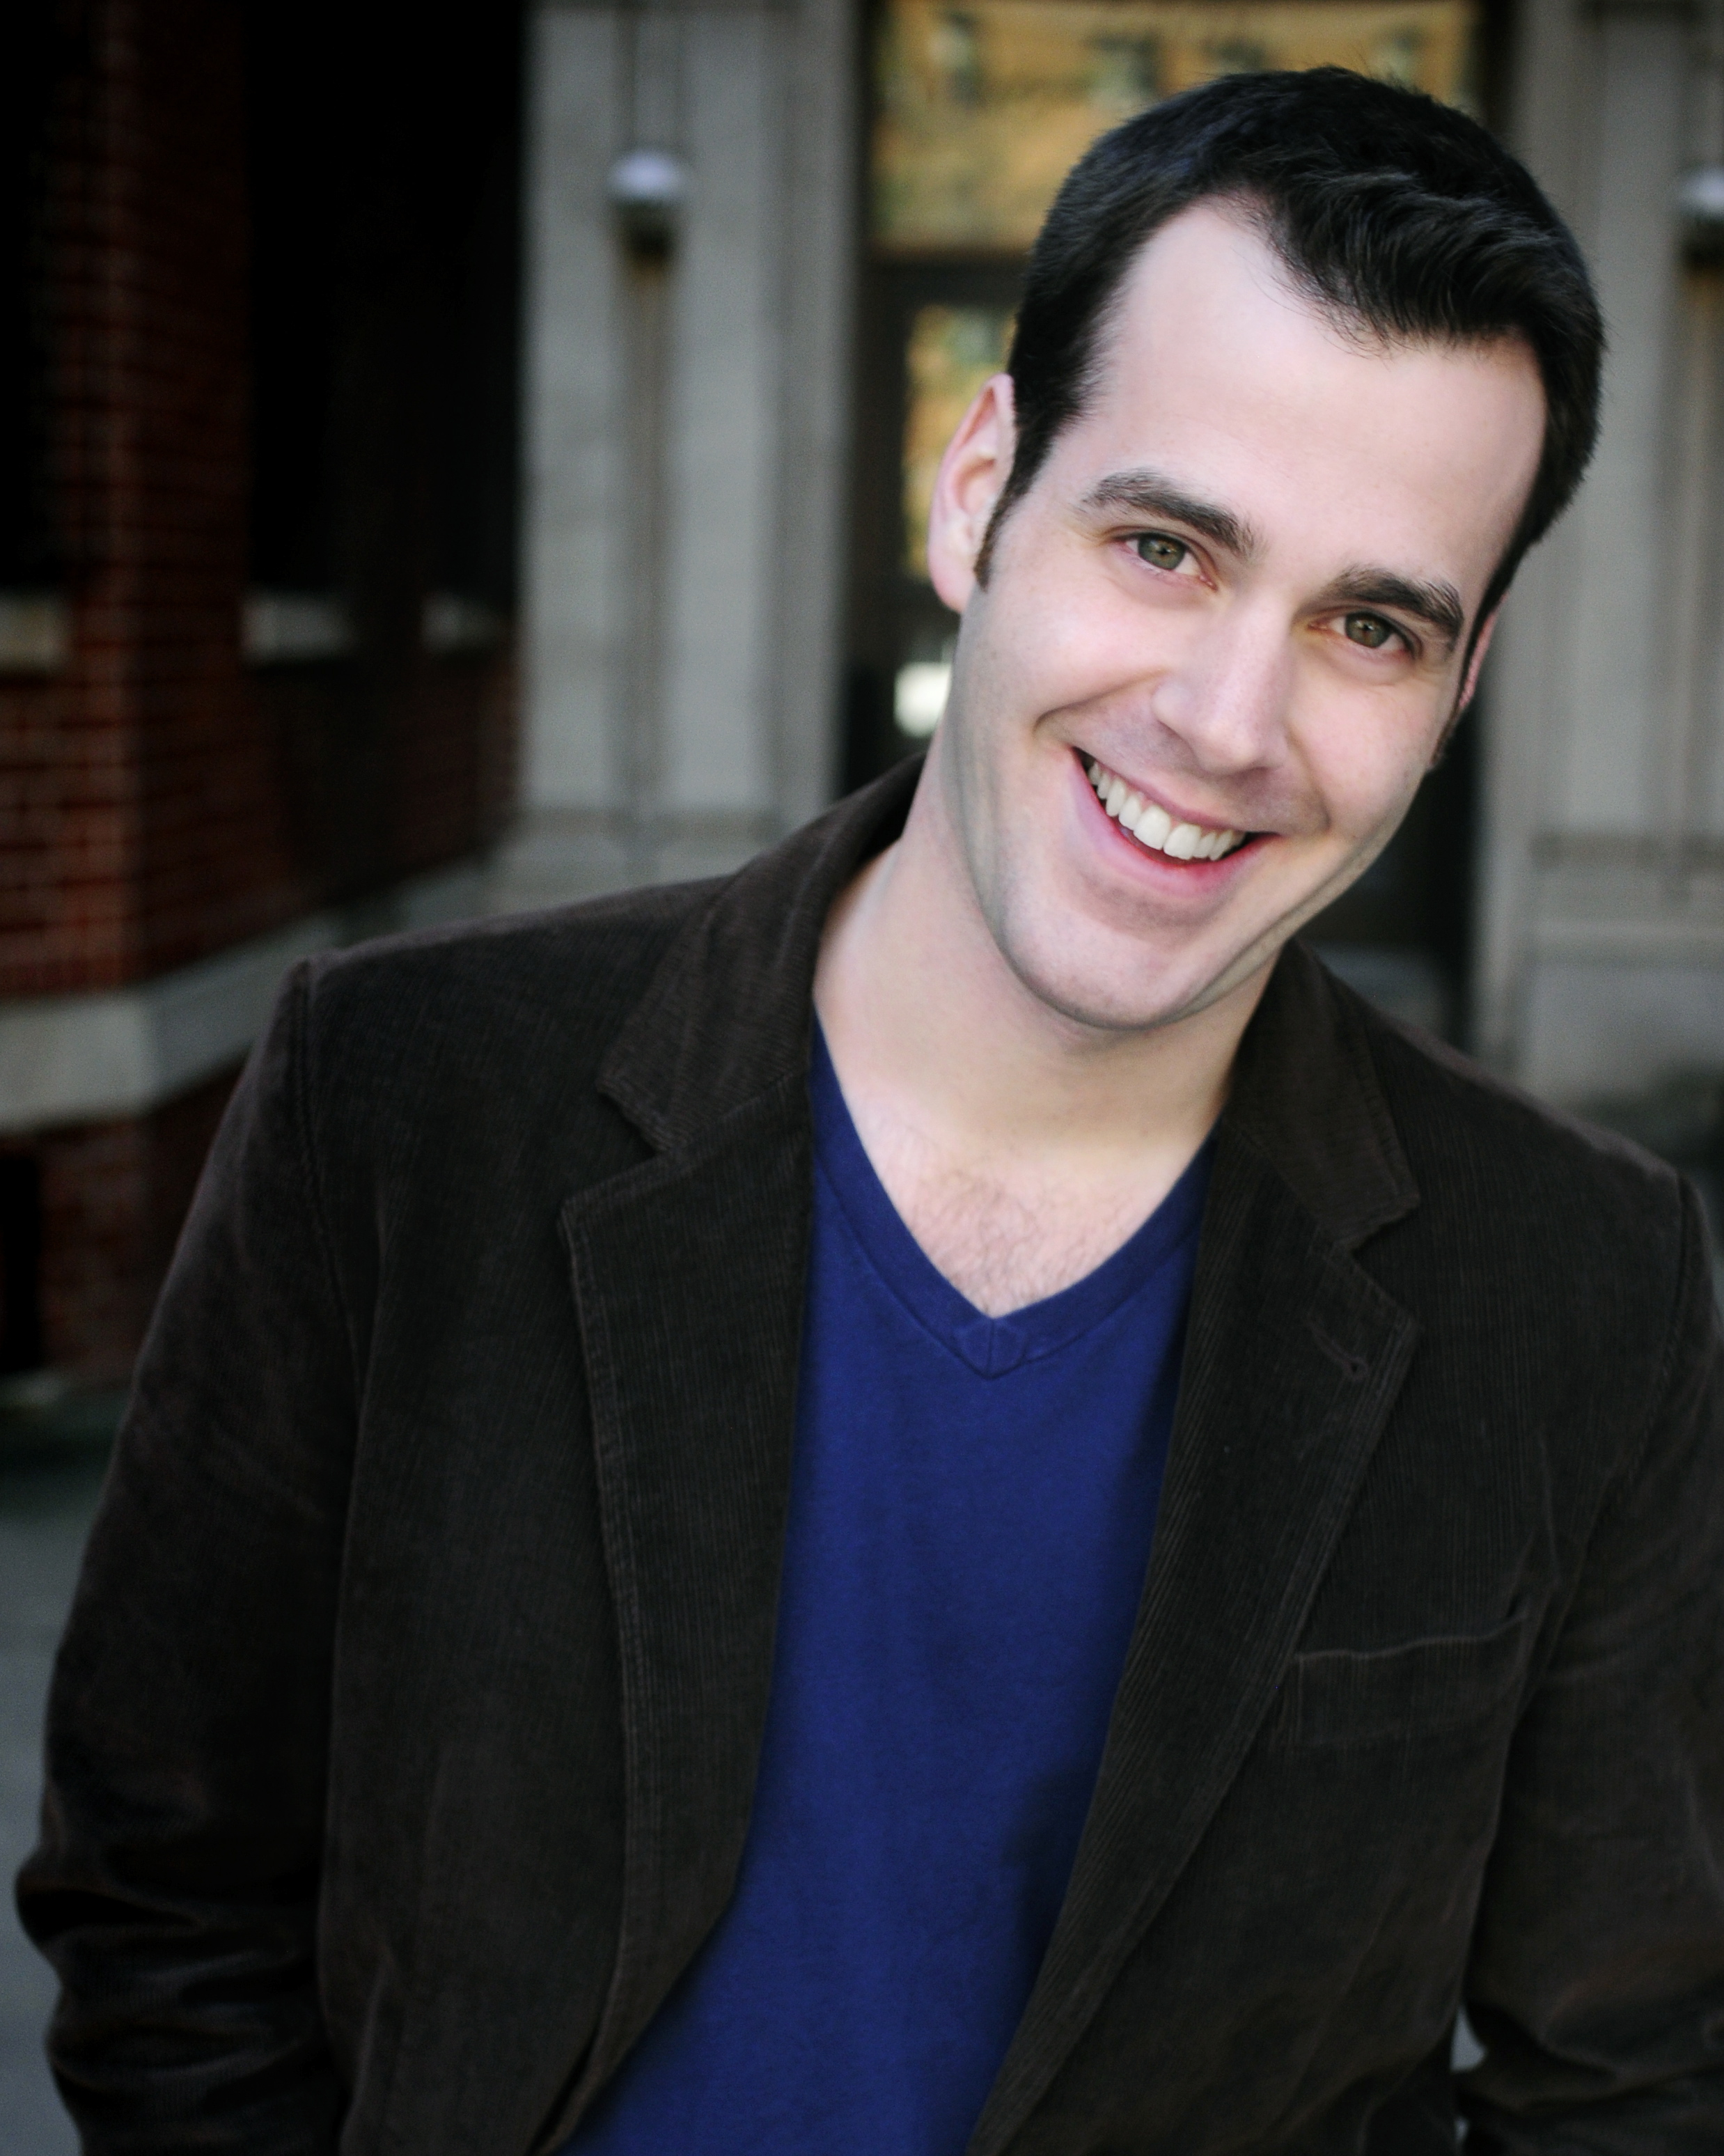 Anthony Apicella